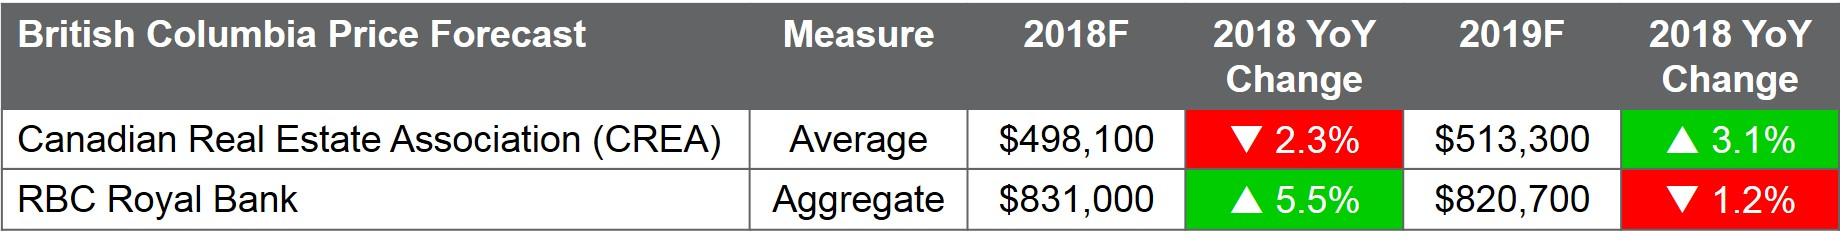 2018 03 15 BC Home Price Forecast.jpg